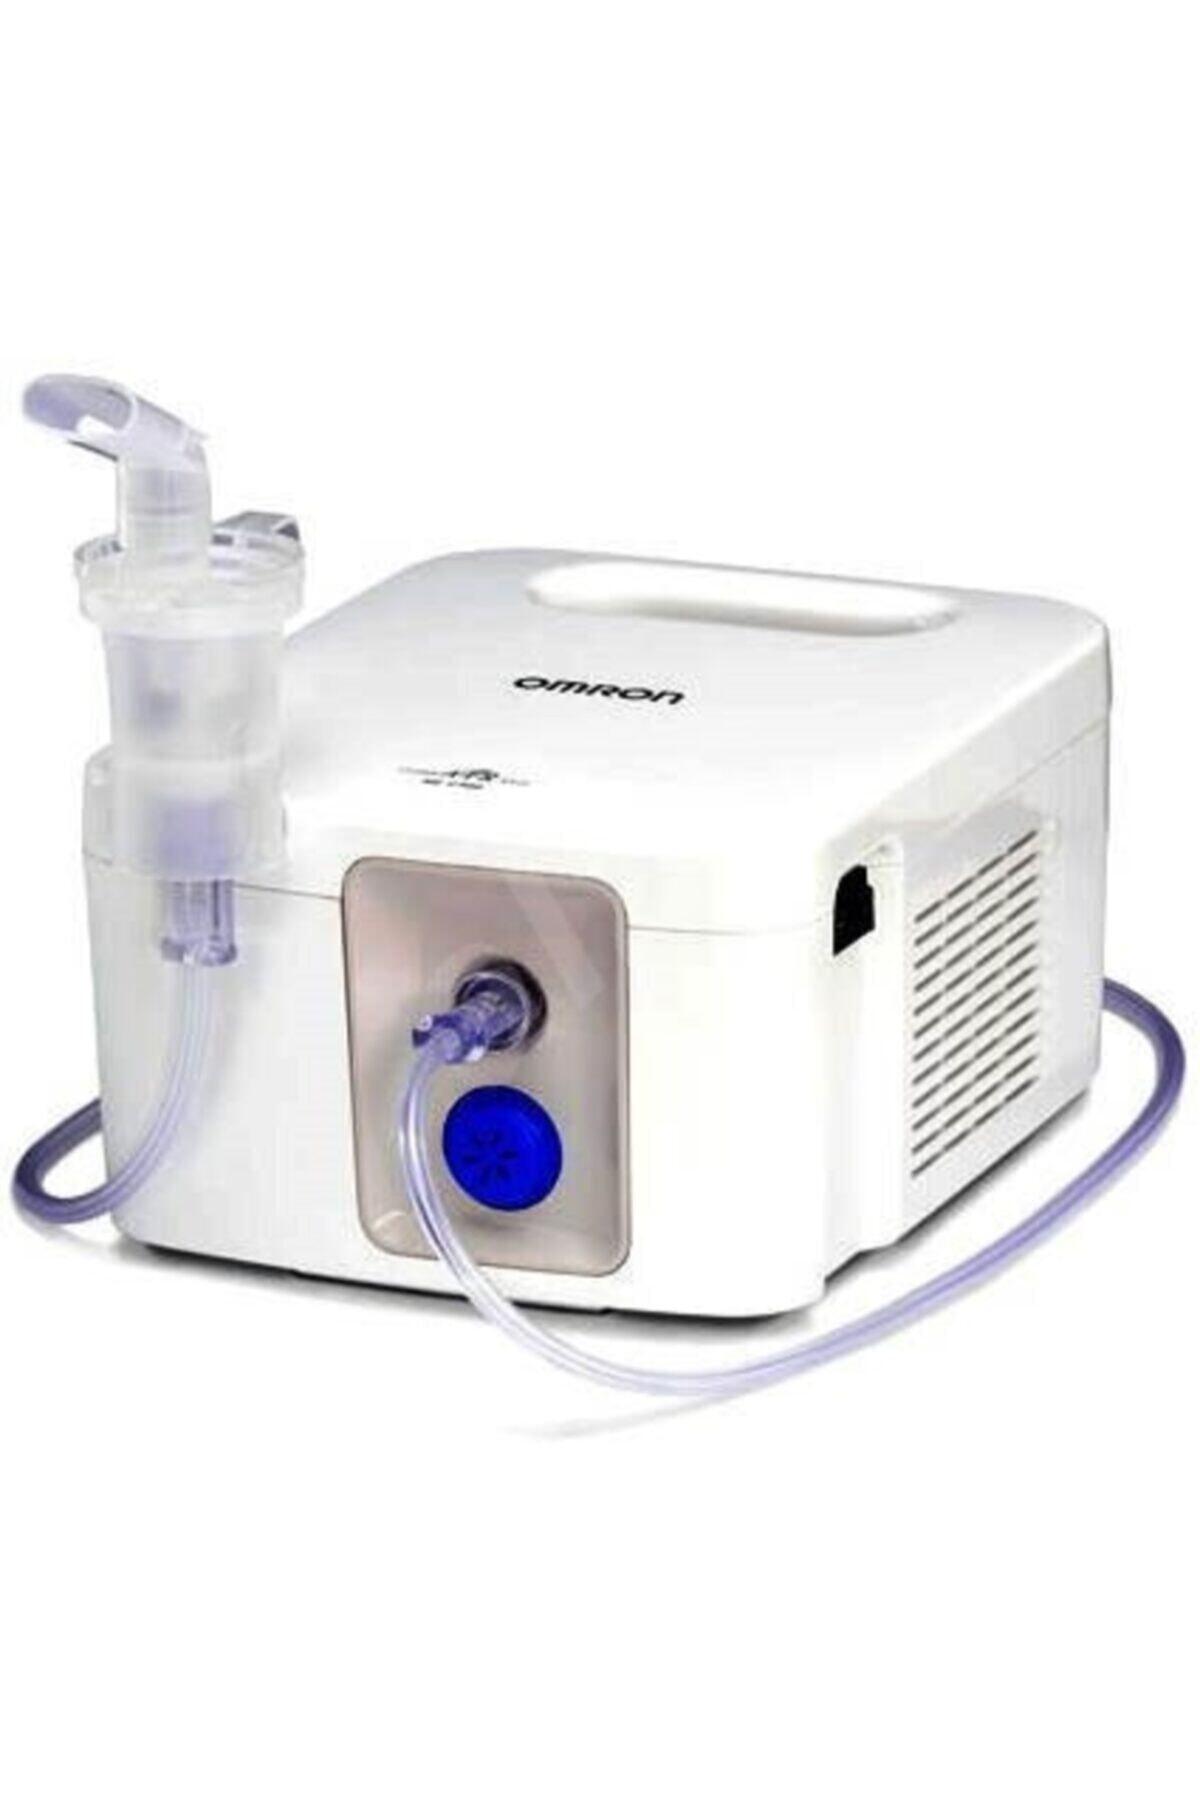 Omron C900 Hastane Tipi Kompresorlu Nebulizator 1